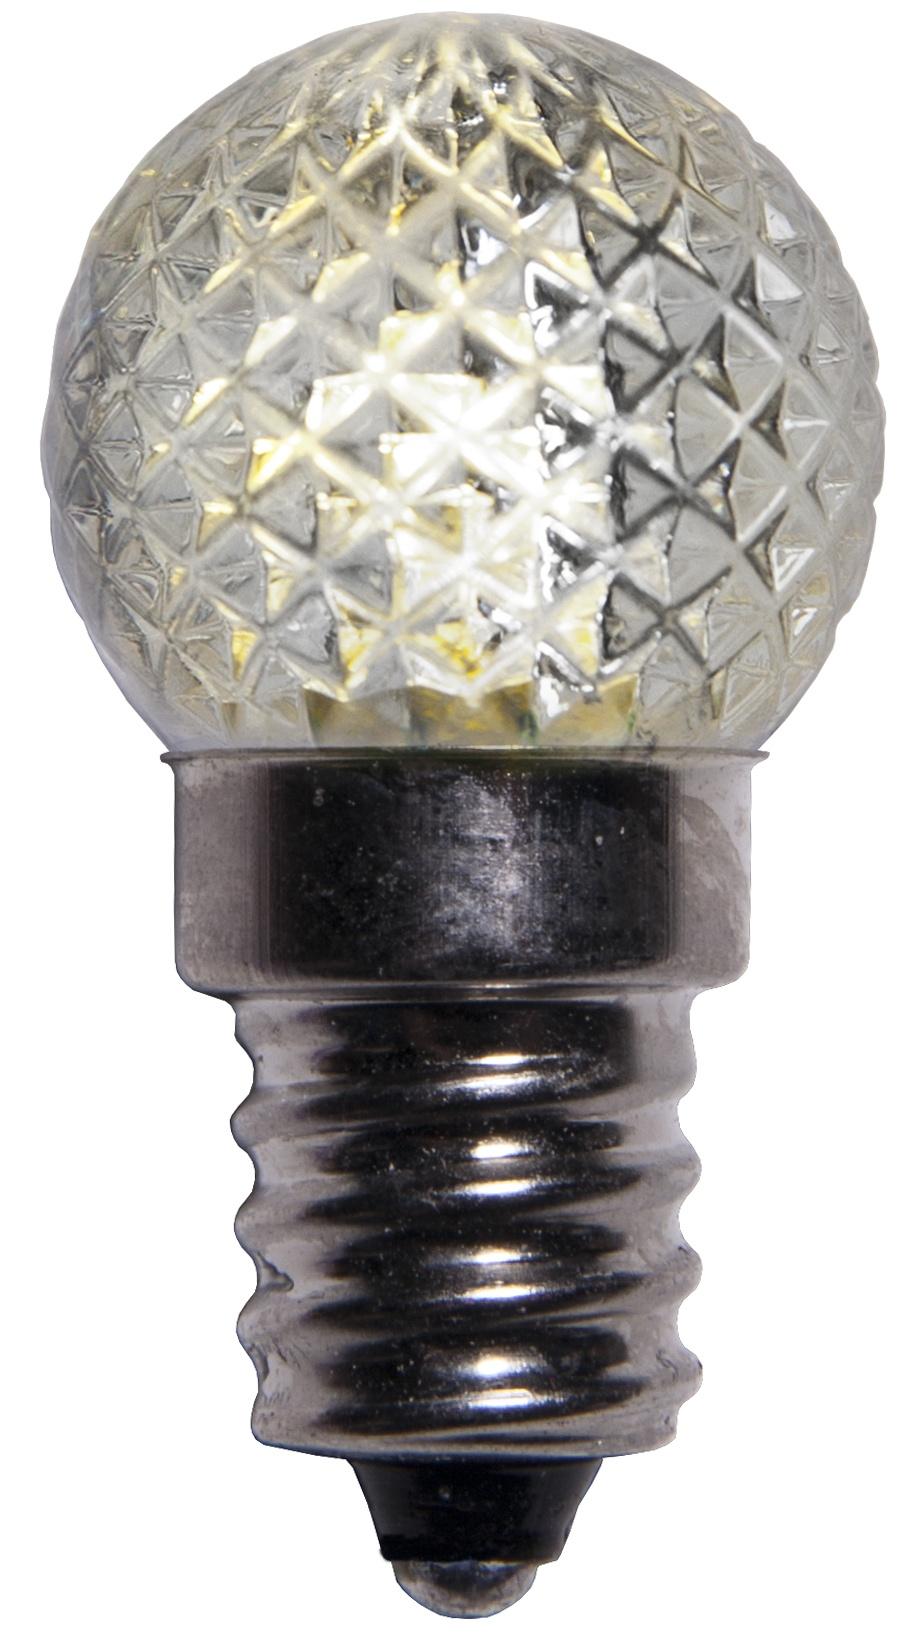 G20 warm white led globe light bulbs